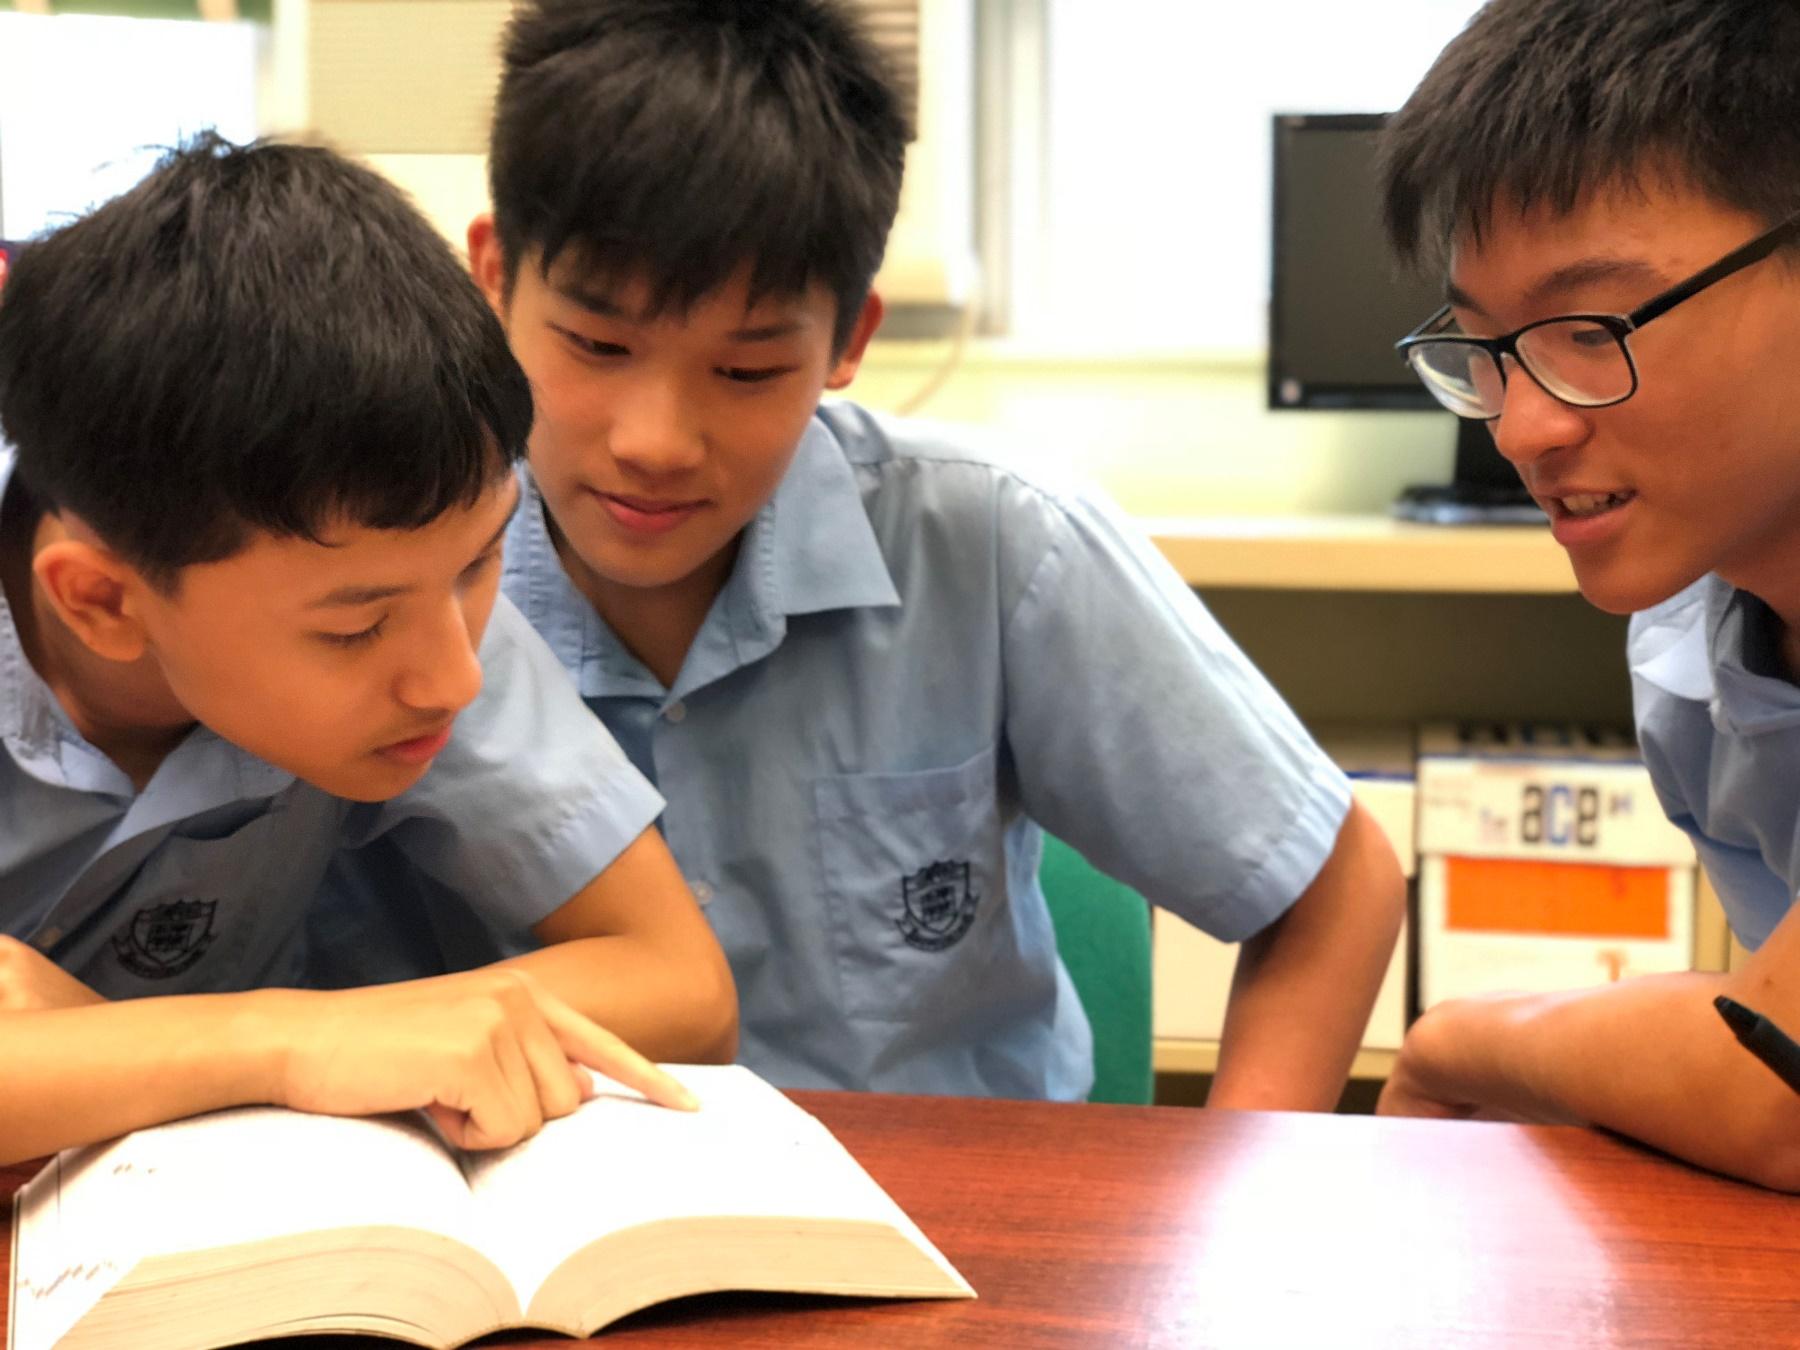 http://www.npc.edu.hk/sites/default/files/img_9600.jpg